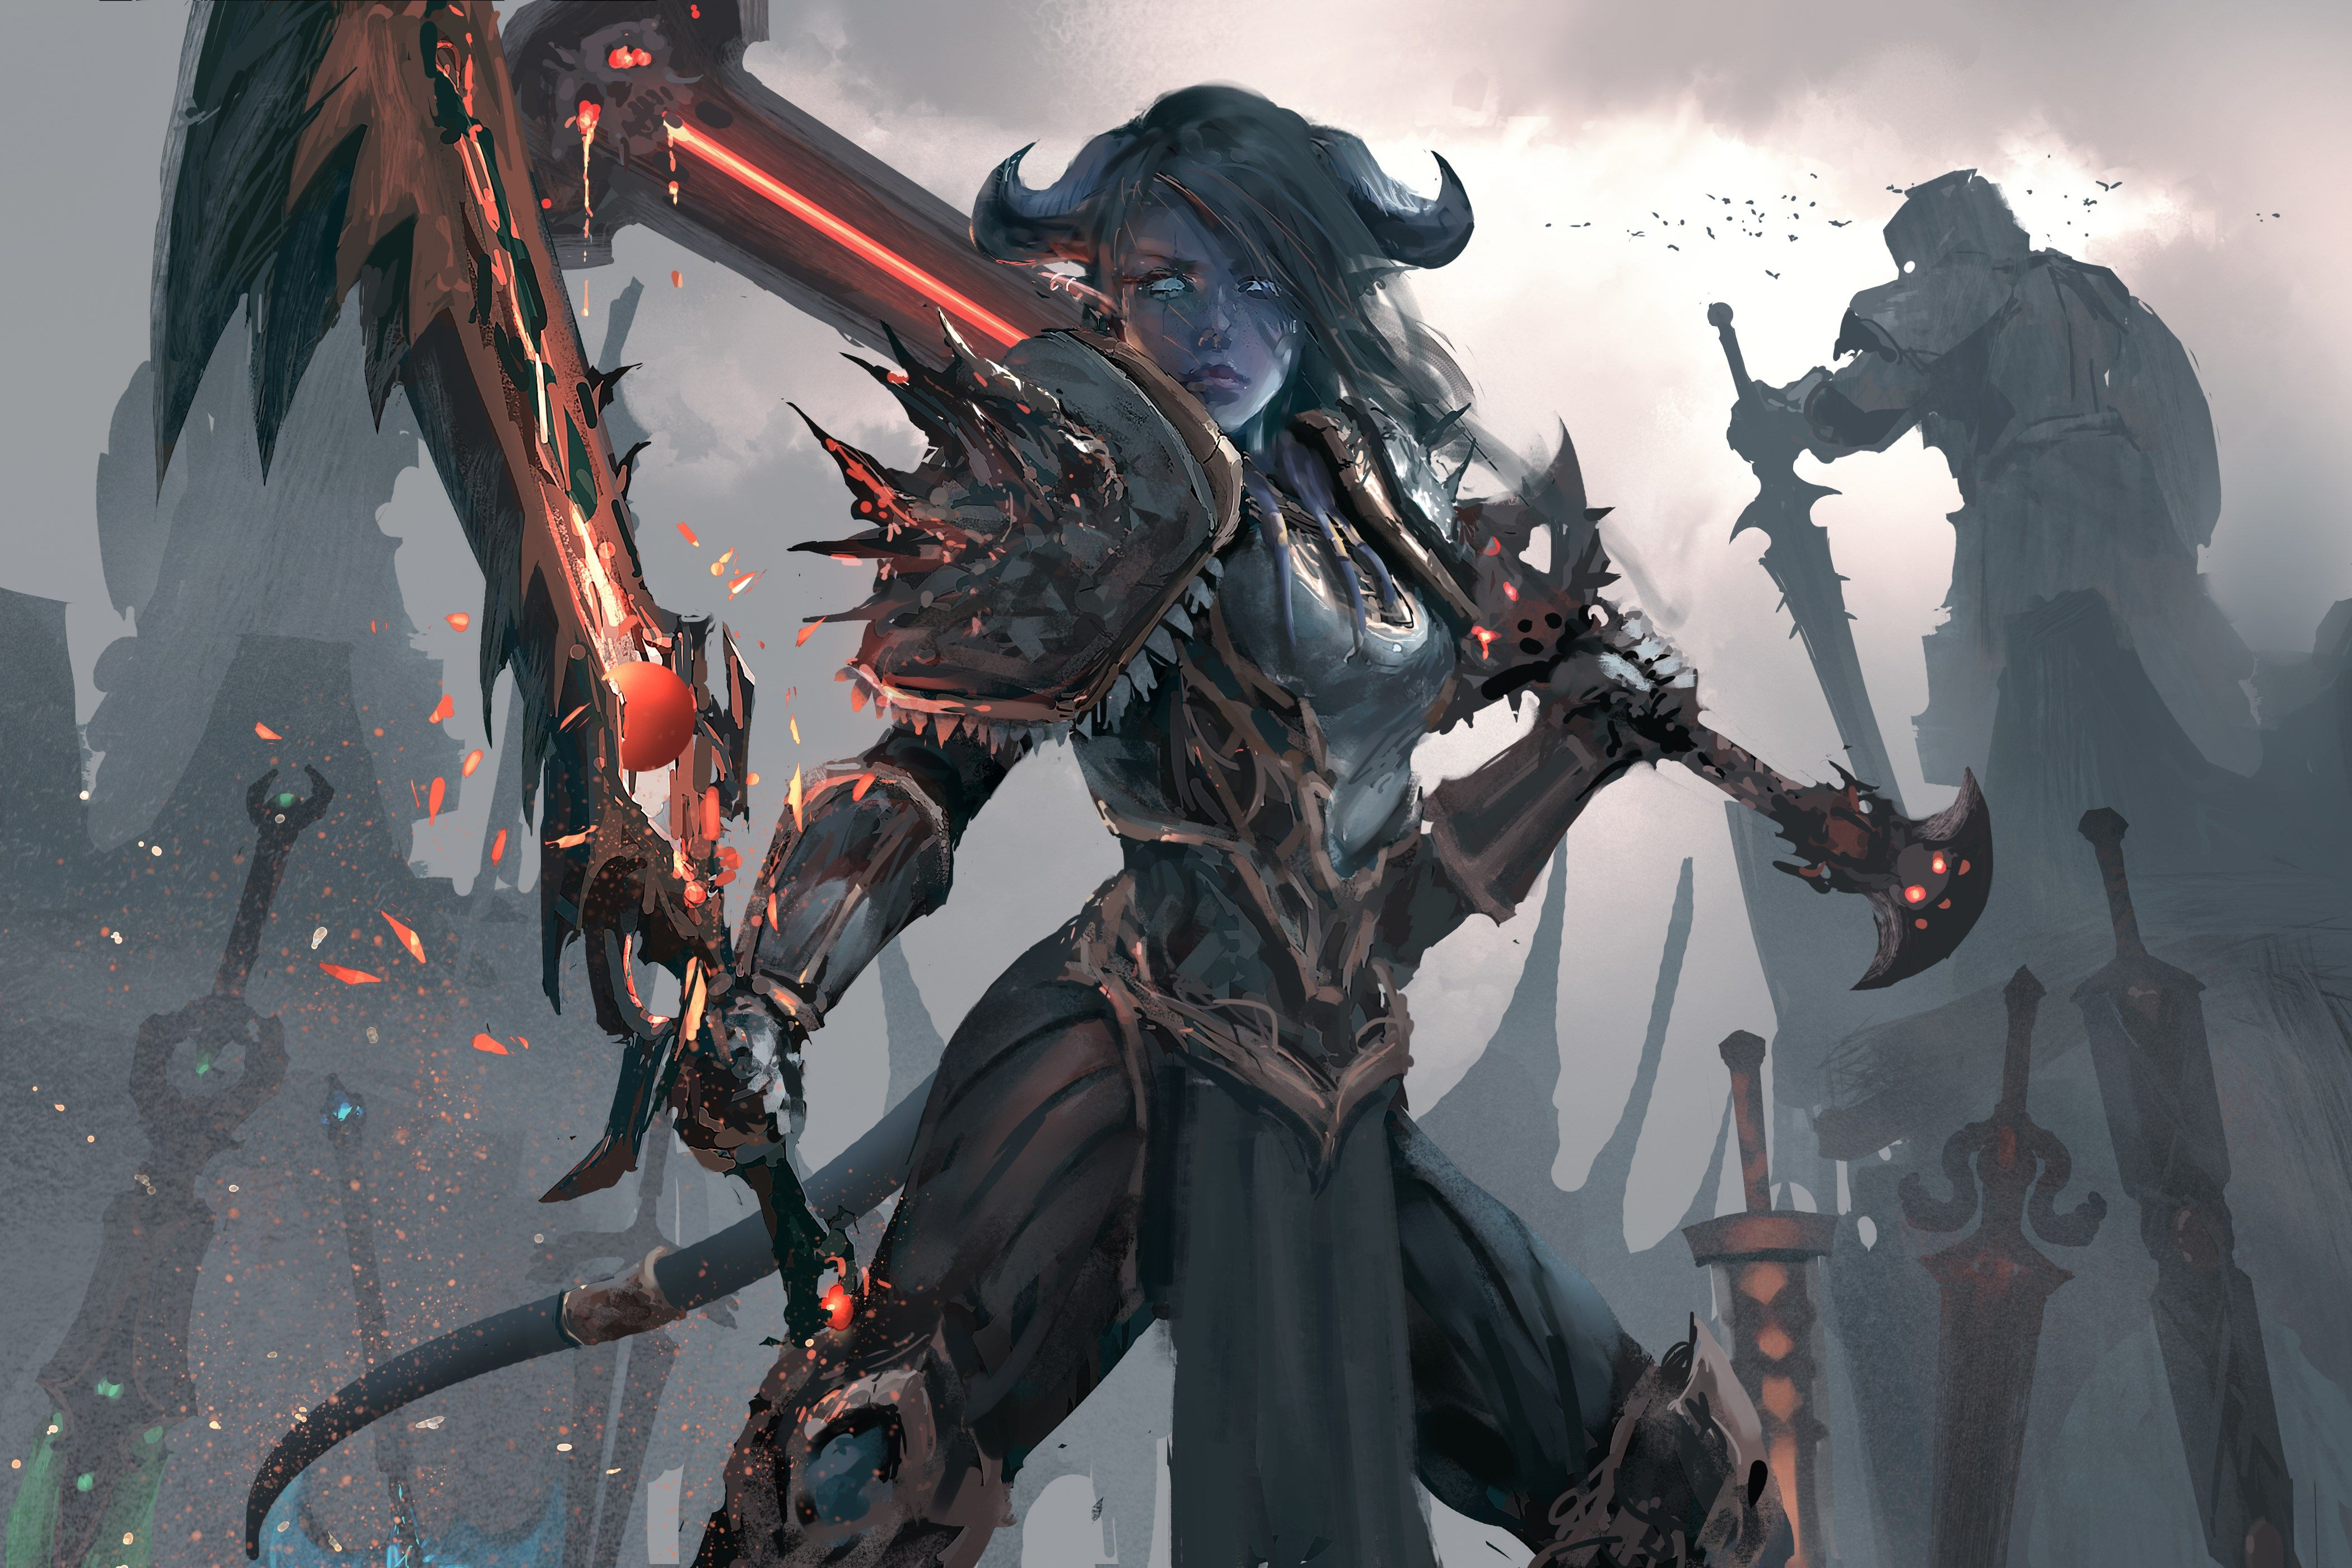 World Of Warcraft 4k Wallpaper 4200x2800 Artifact Art World Of Warcraft Warcraft Art